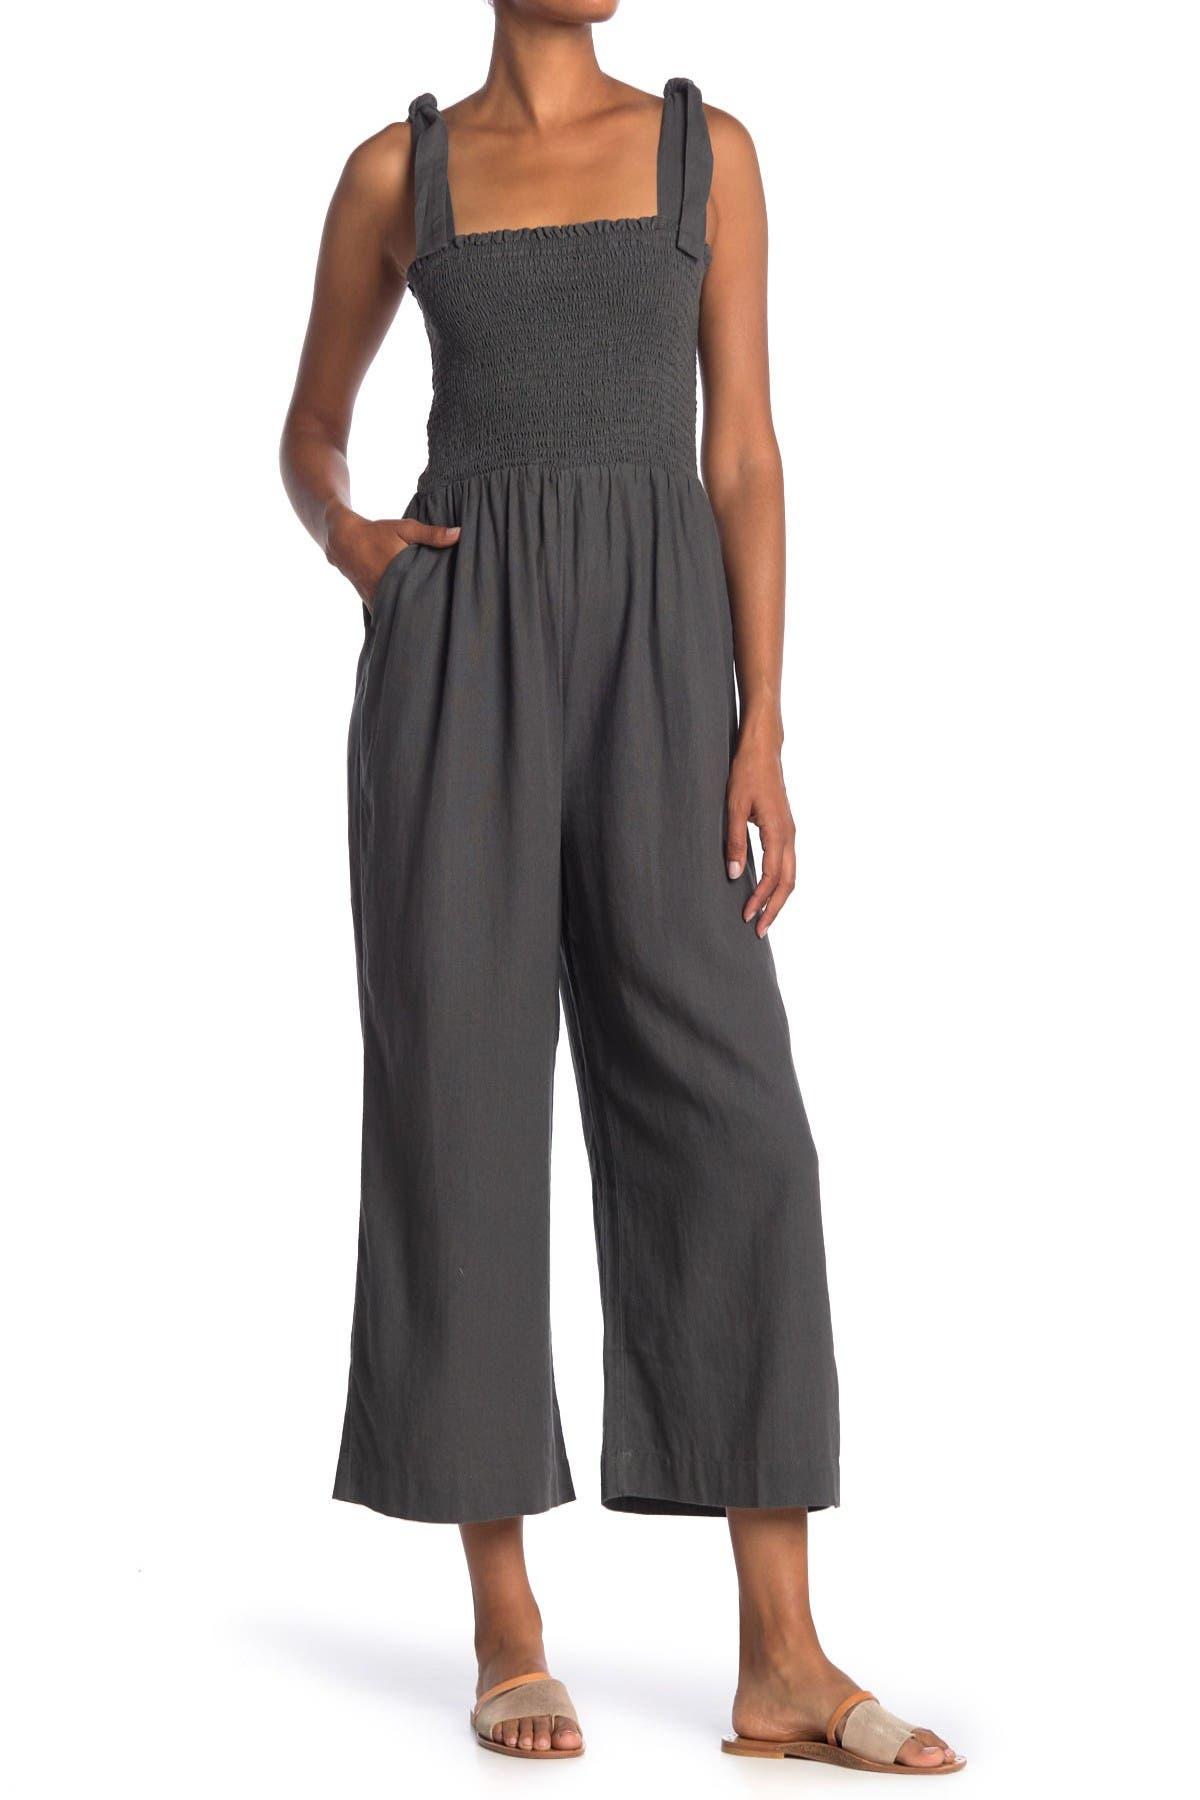 Image of SUSINA Tie Strap Smocked Linen Blend Crop Jumpsuit